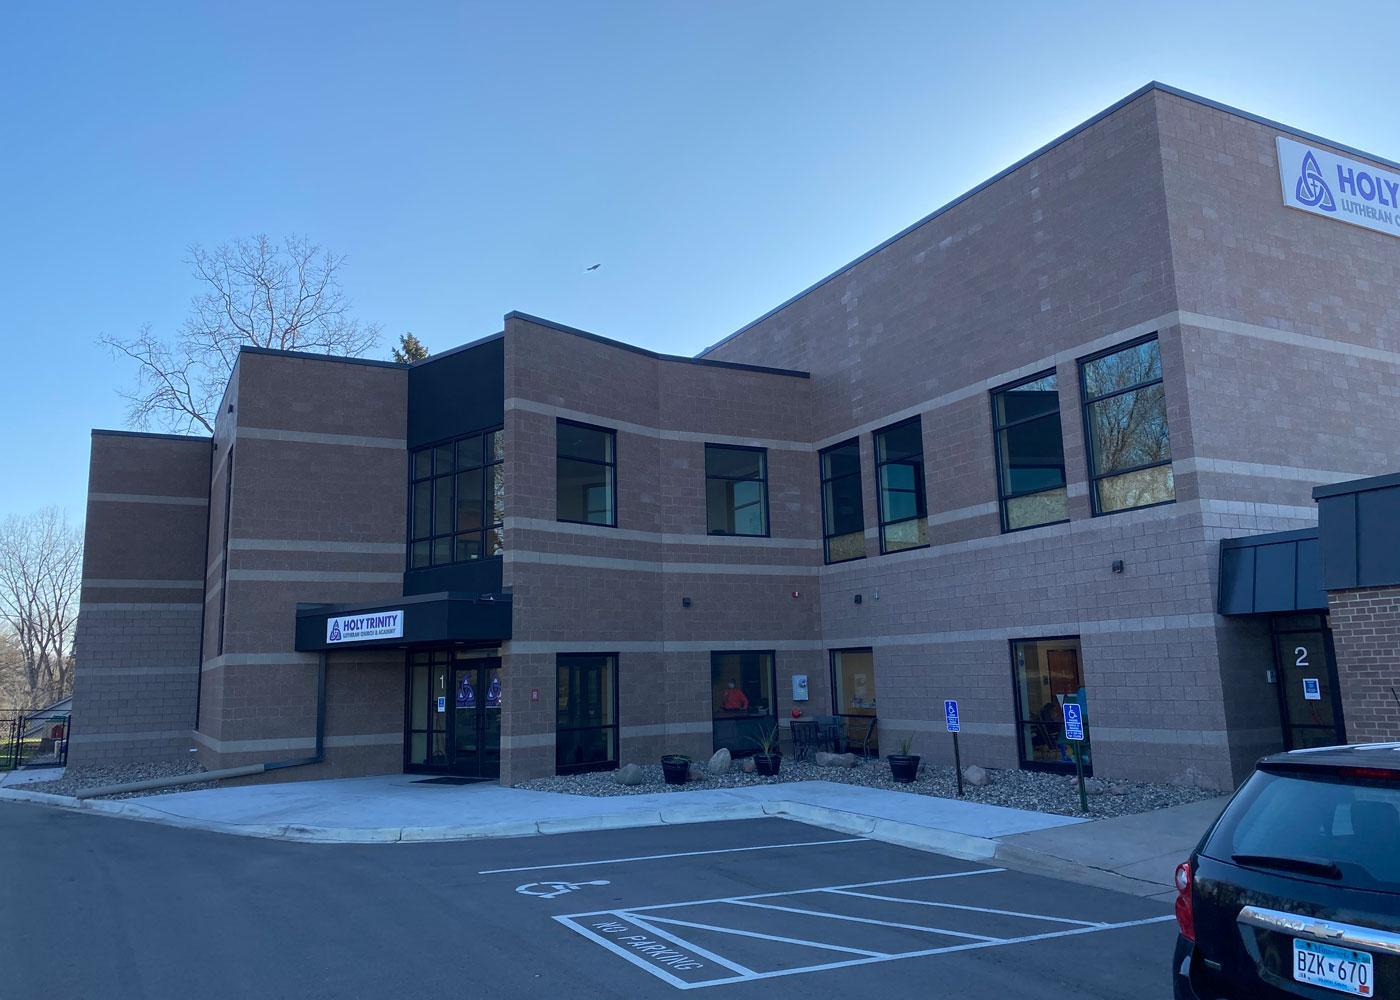 Holy Trinity Lutheran Church & Academy